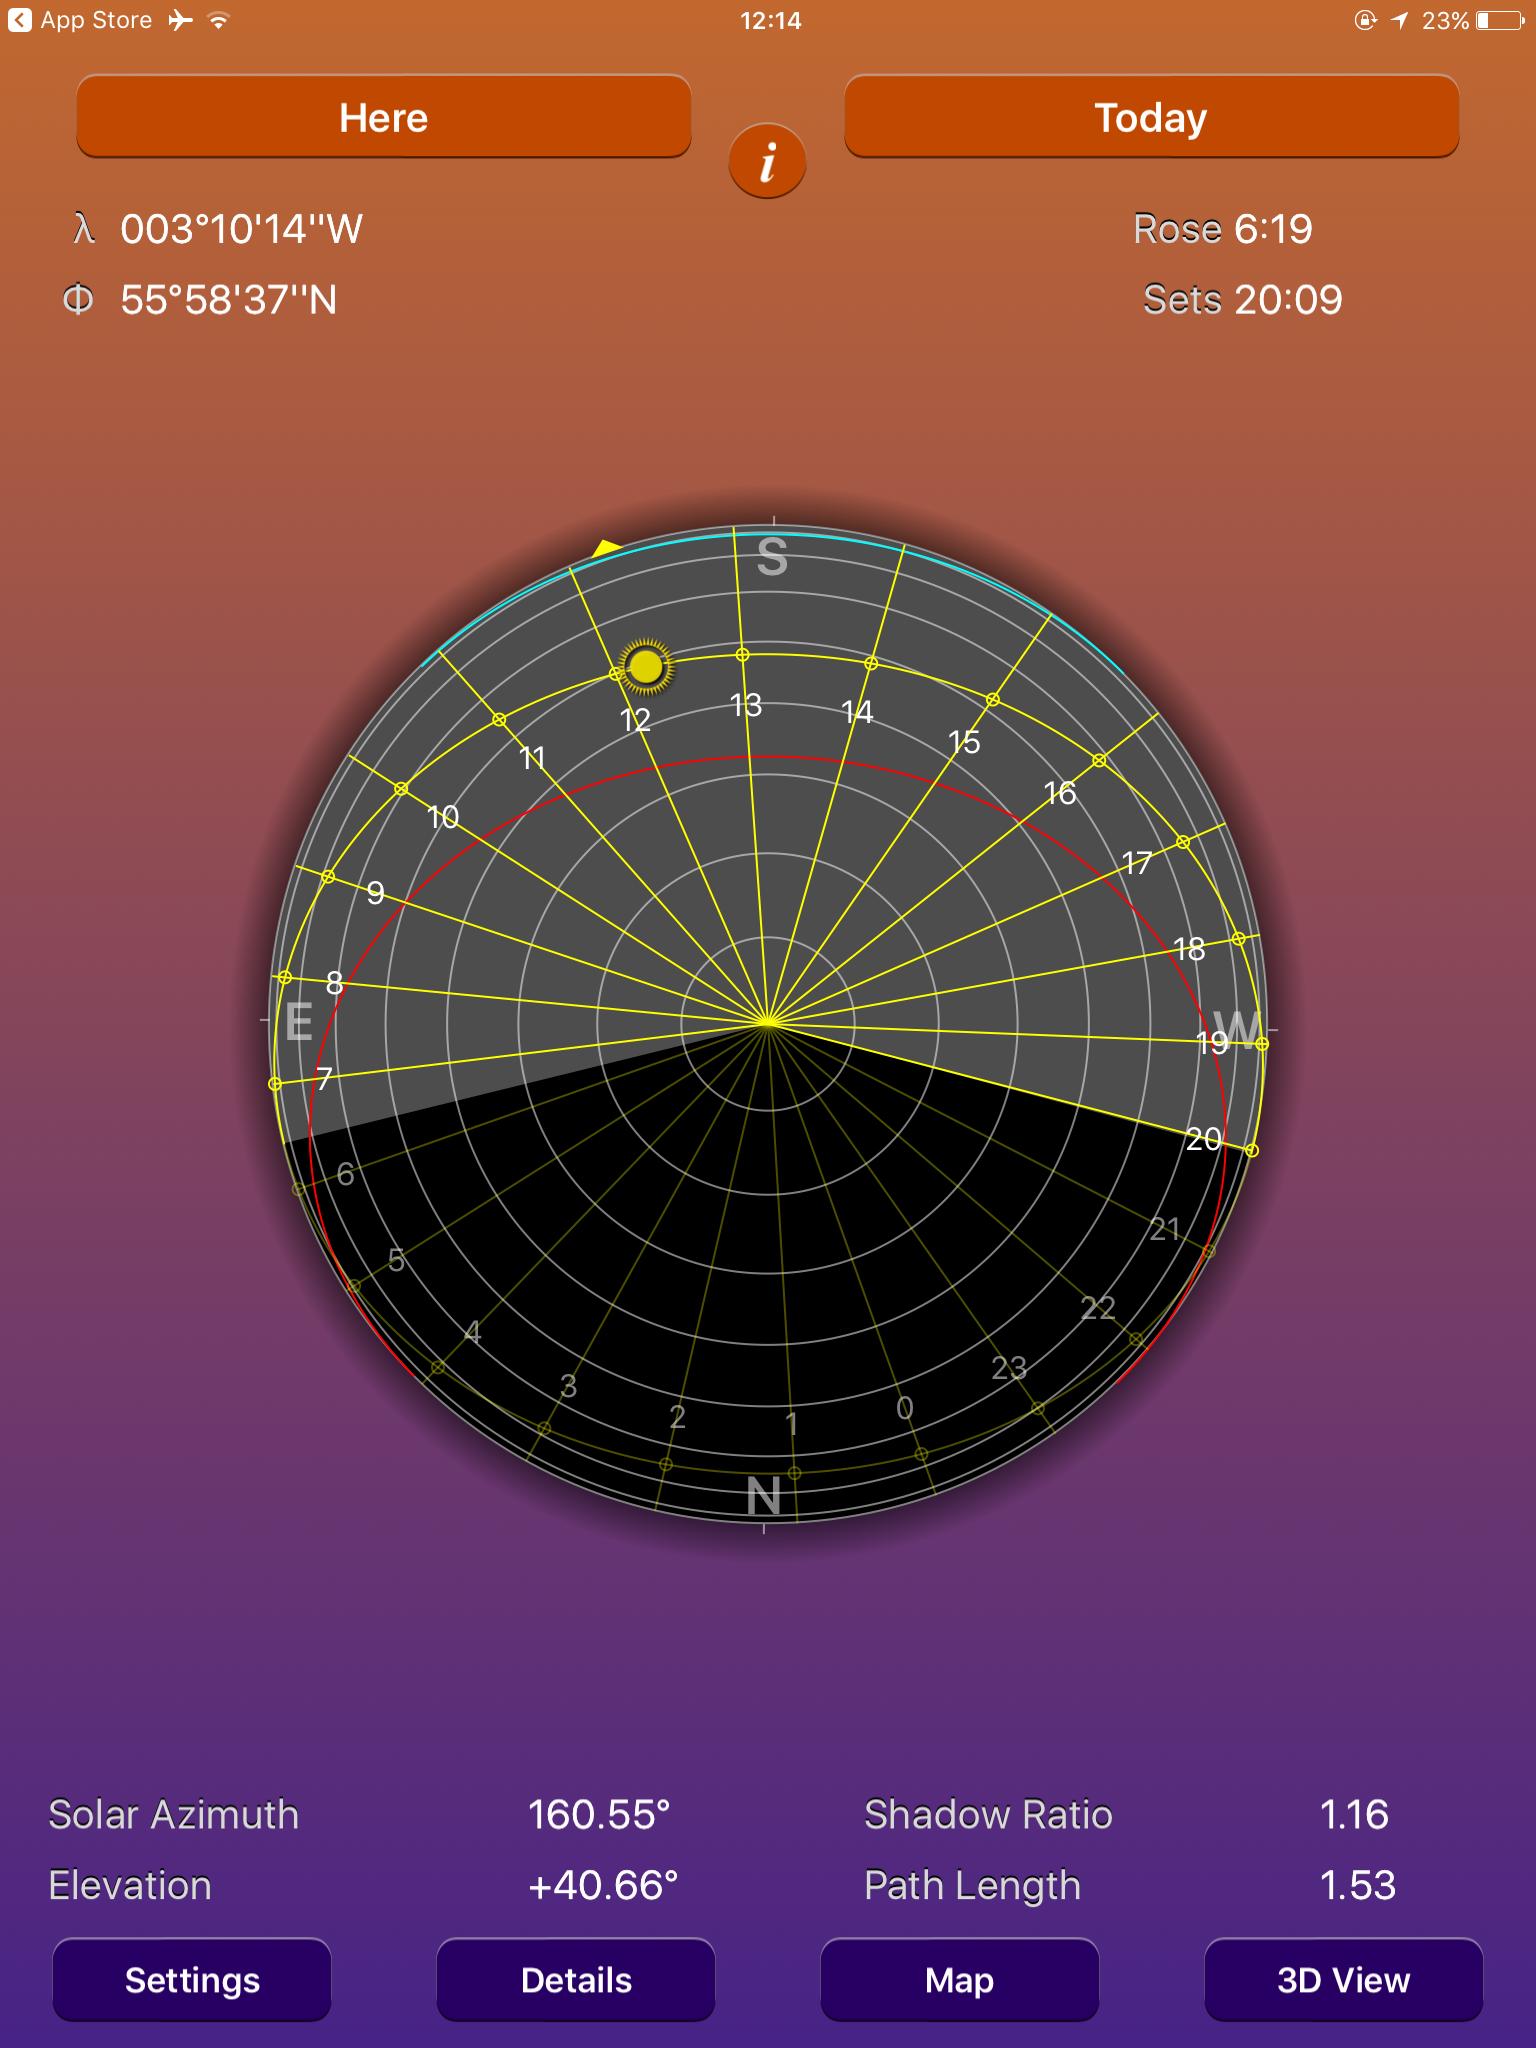 Sun Seekers App Zac And Zac Blog image